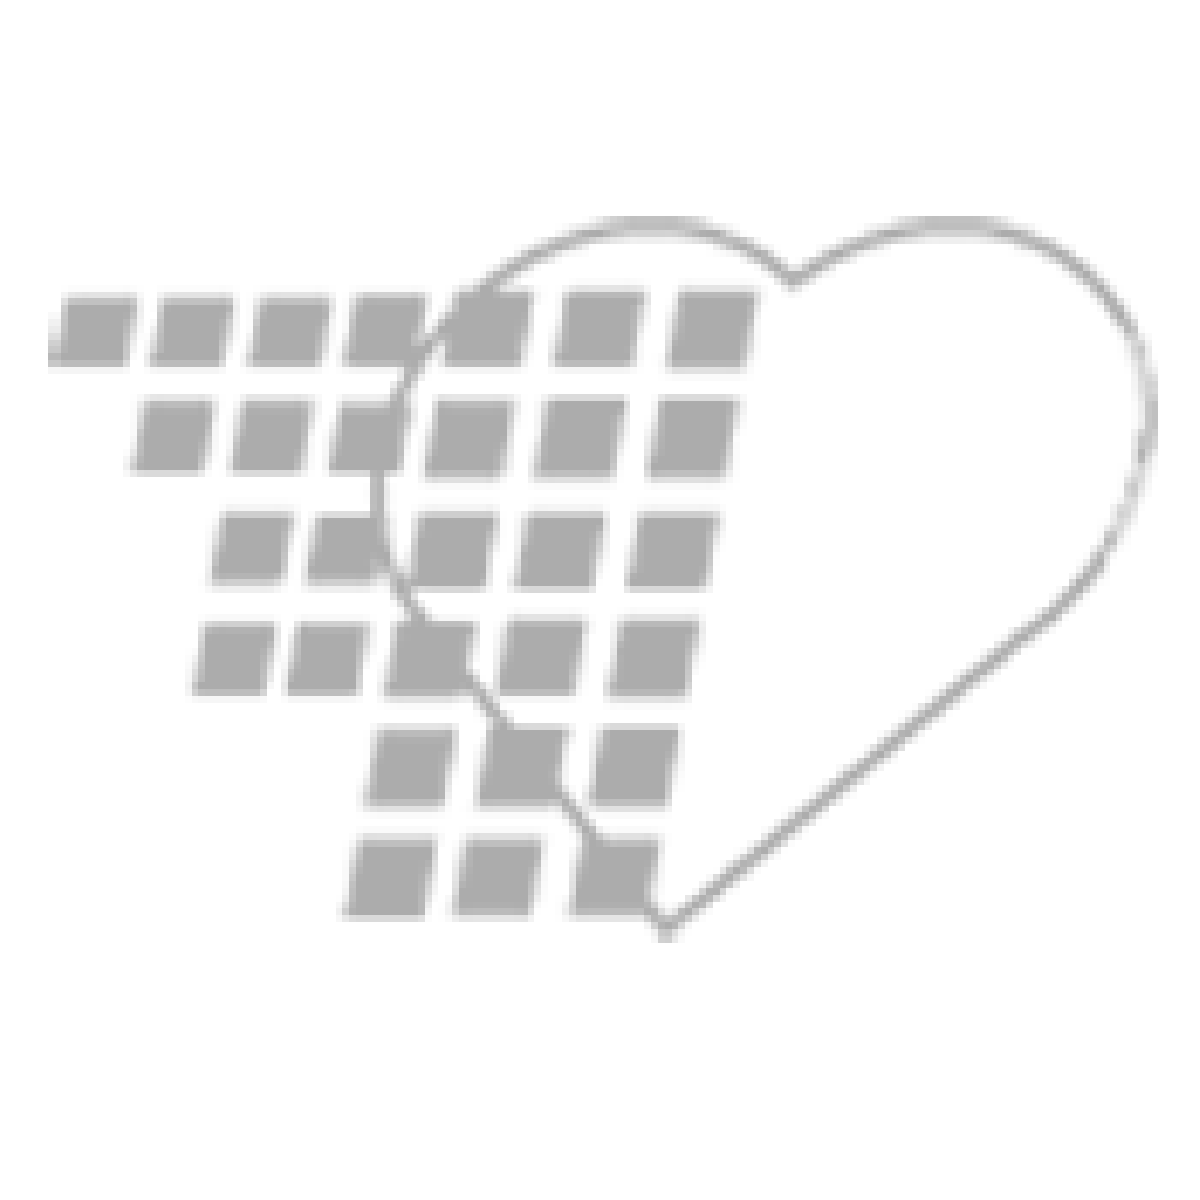 12-81-0958 - Nasco Life/form® Pediatric Arm